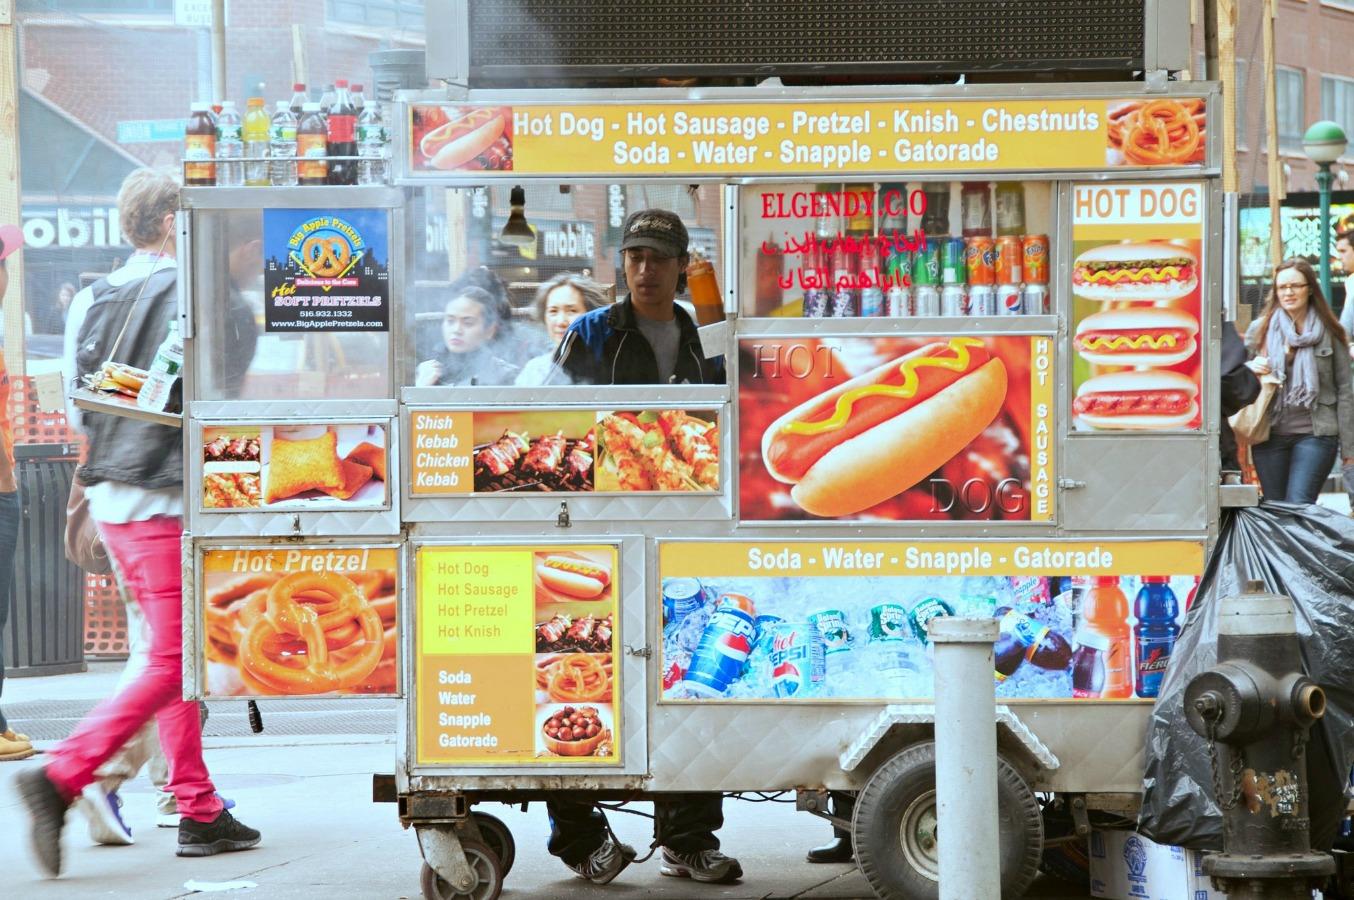 Hot Dog Truck, NYC| © Tony Fischer/flickr